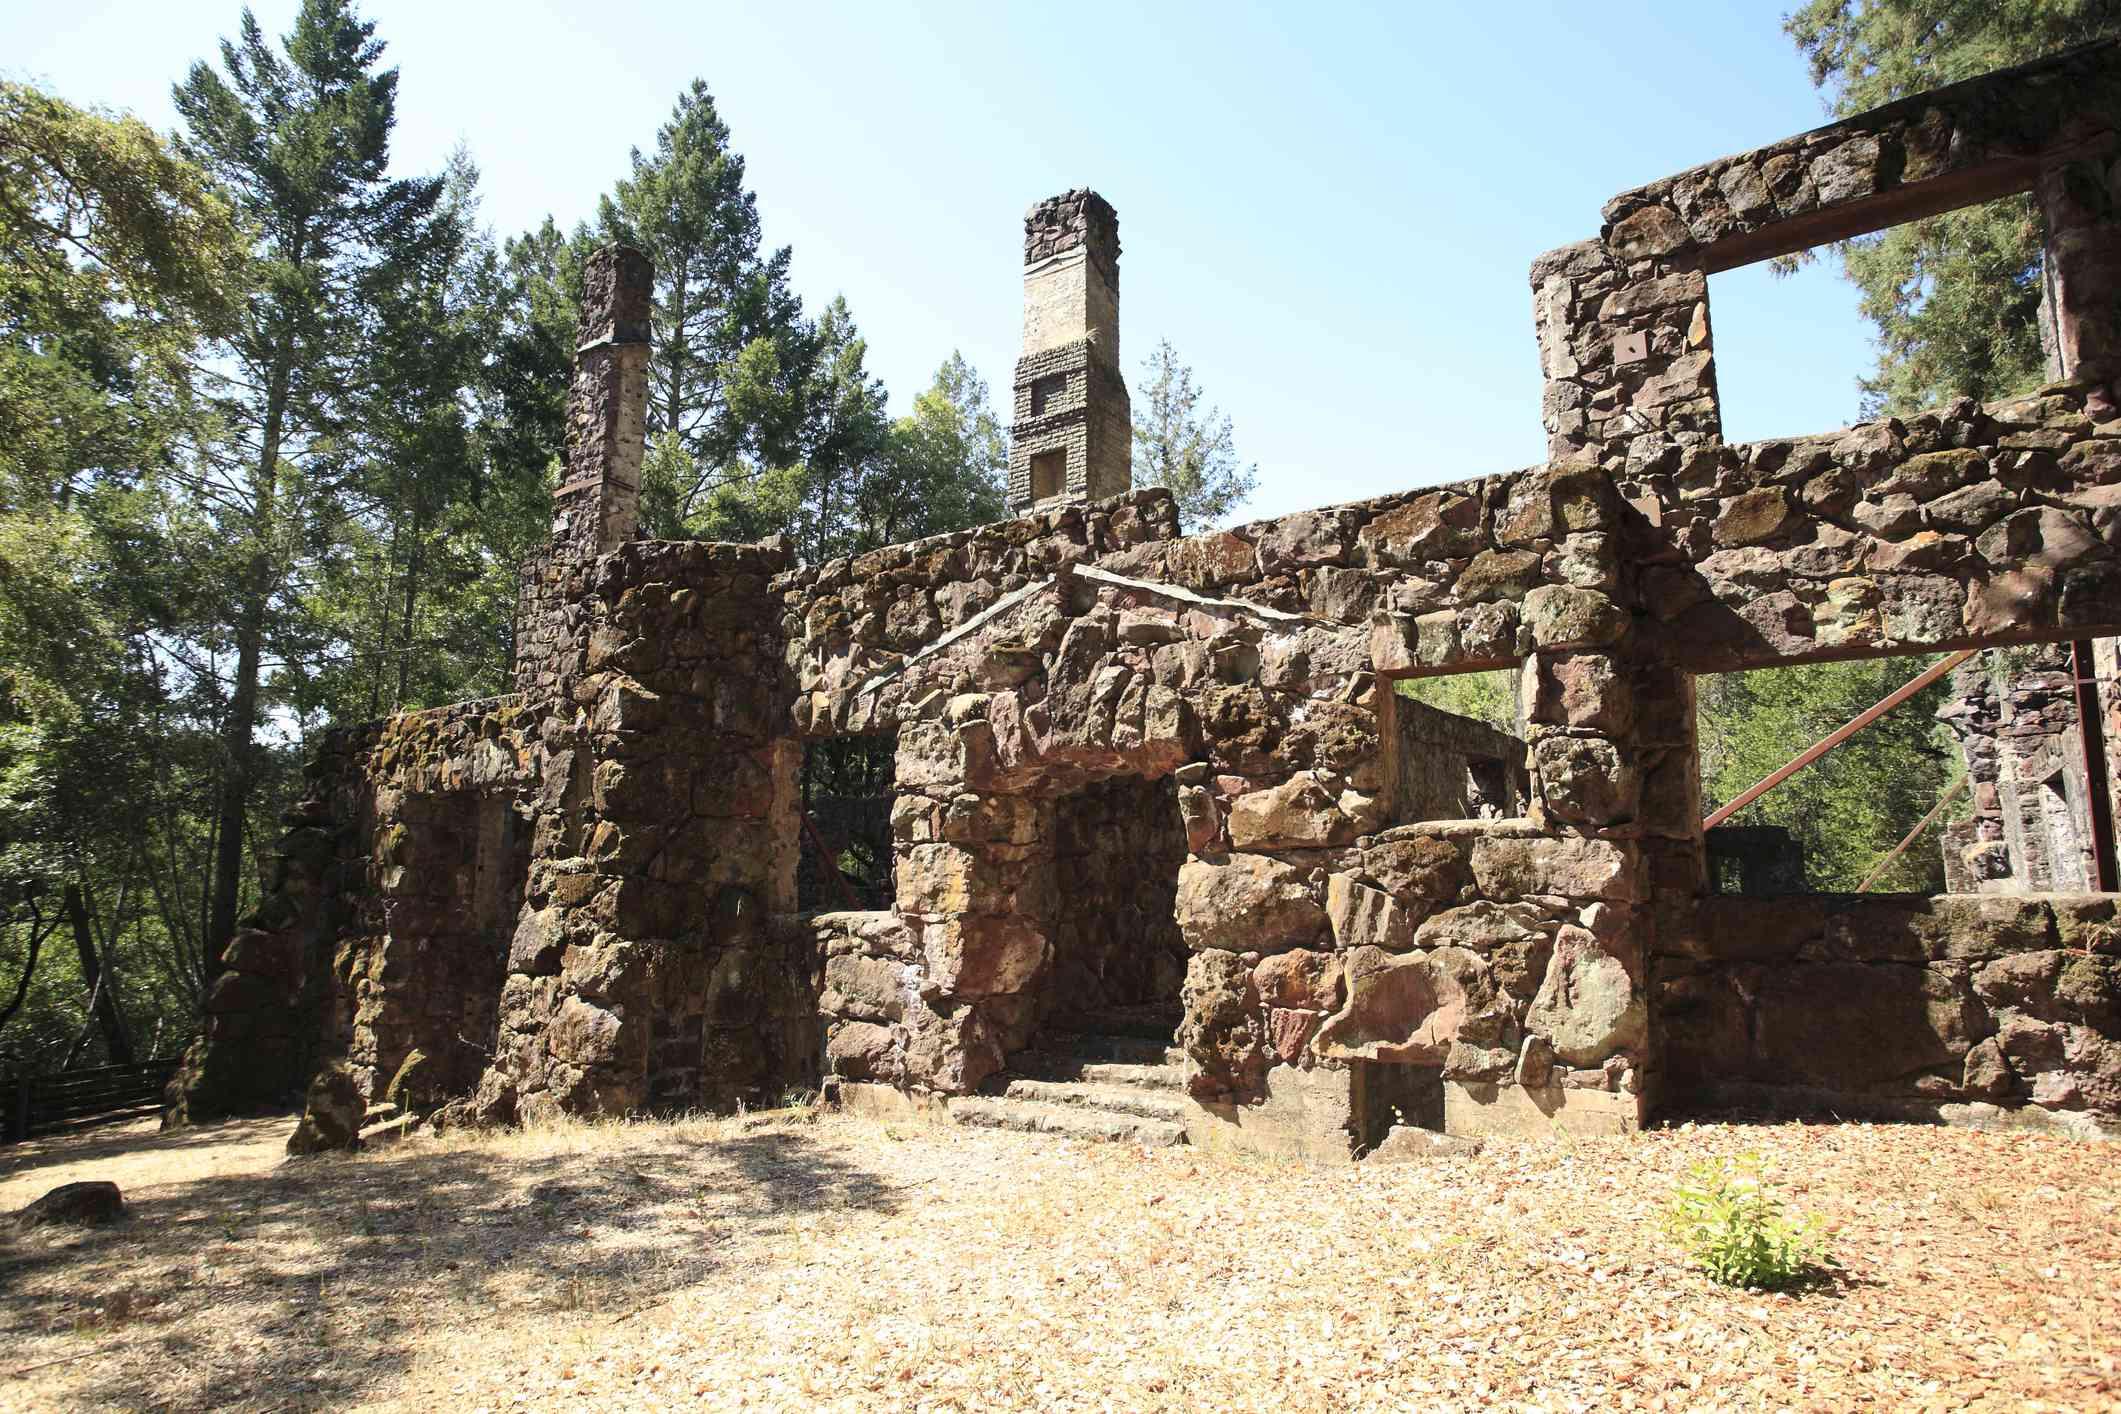 Jack London State Historic Park in California